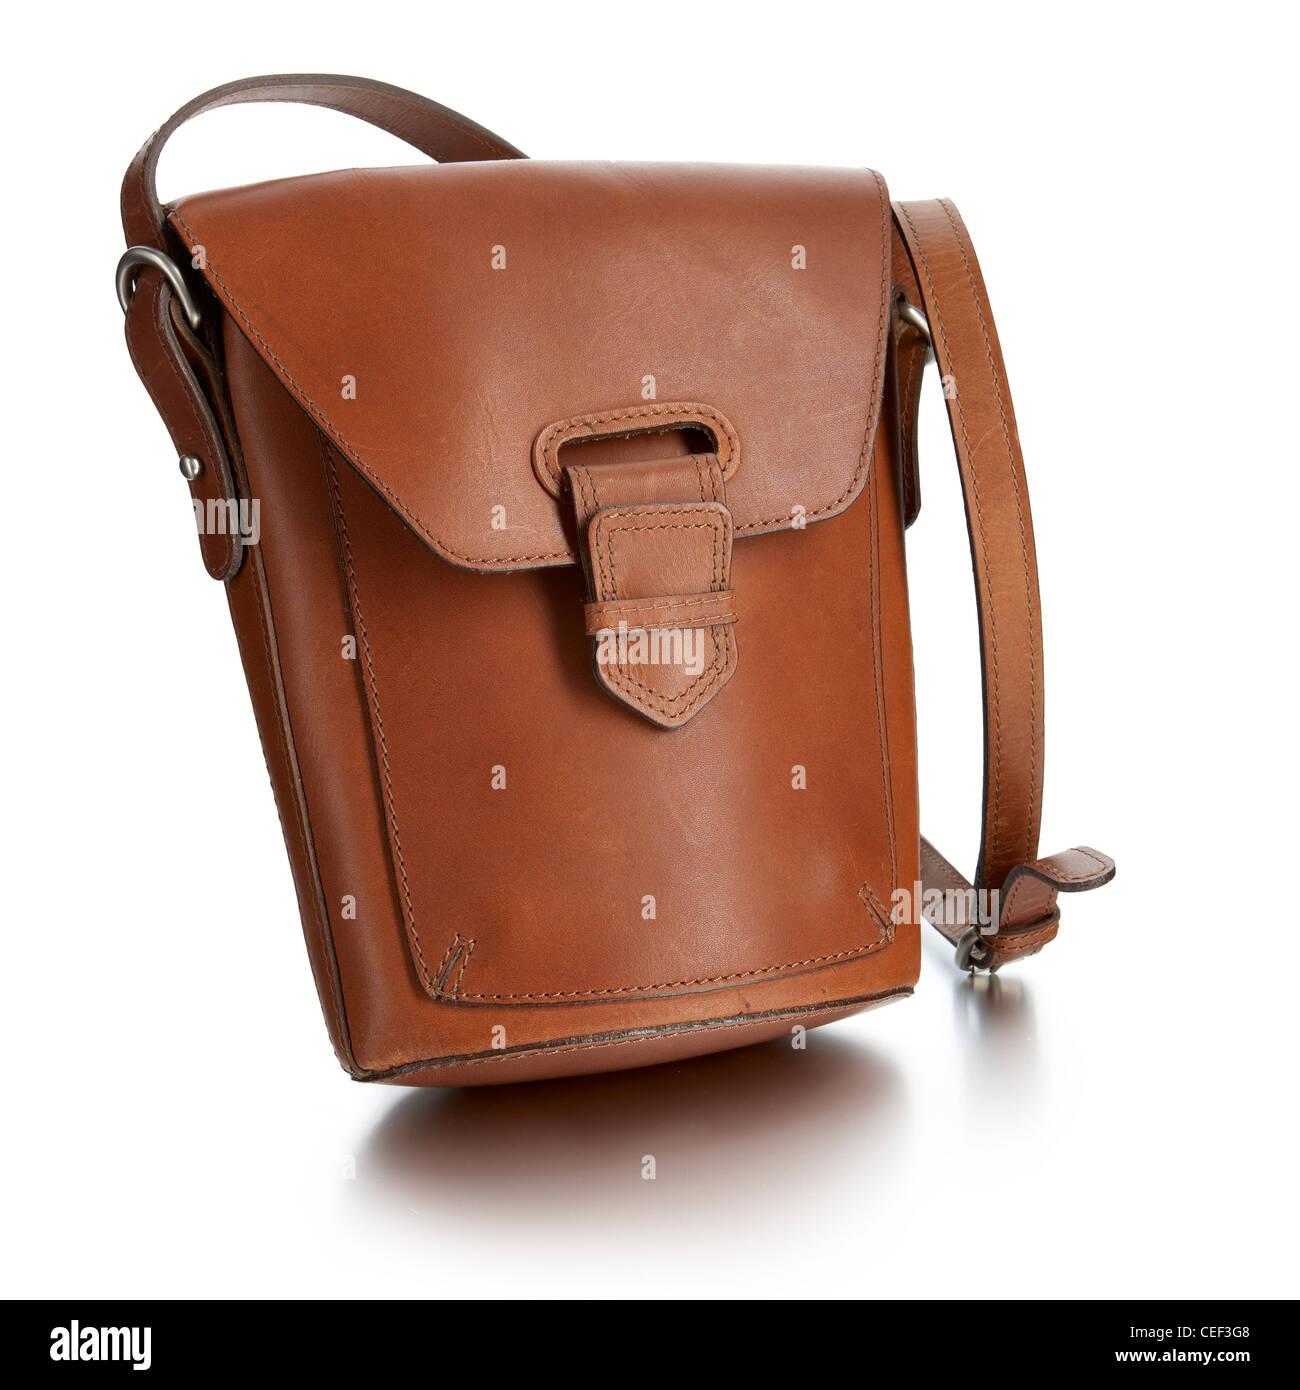 leather messenger bag - Stock Image